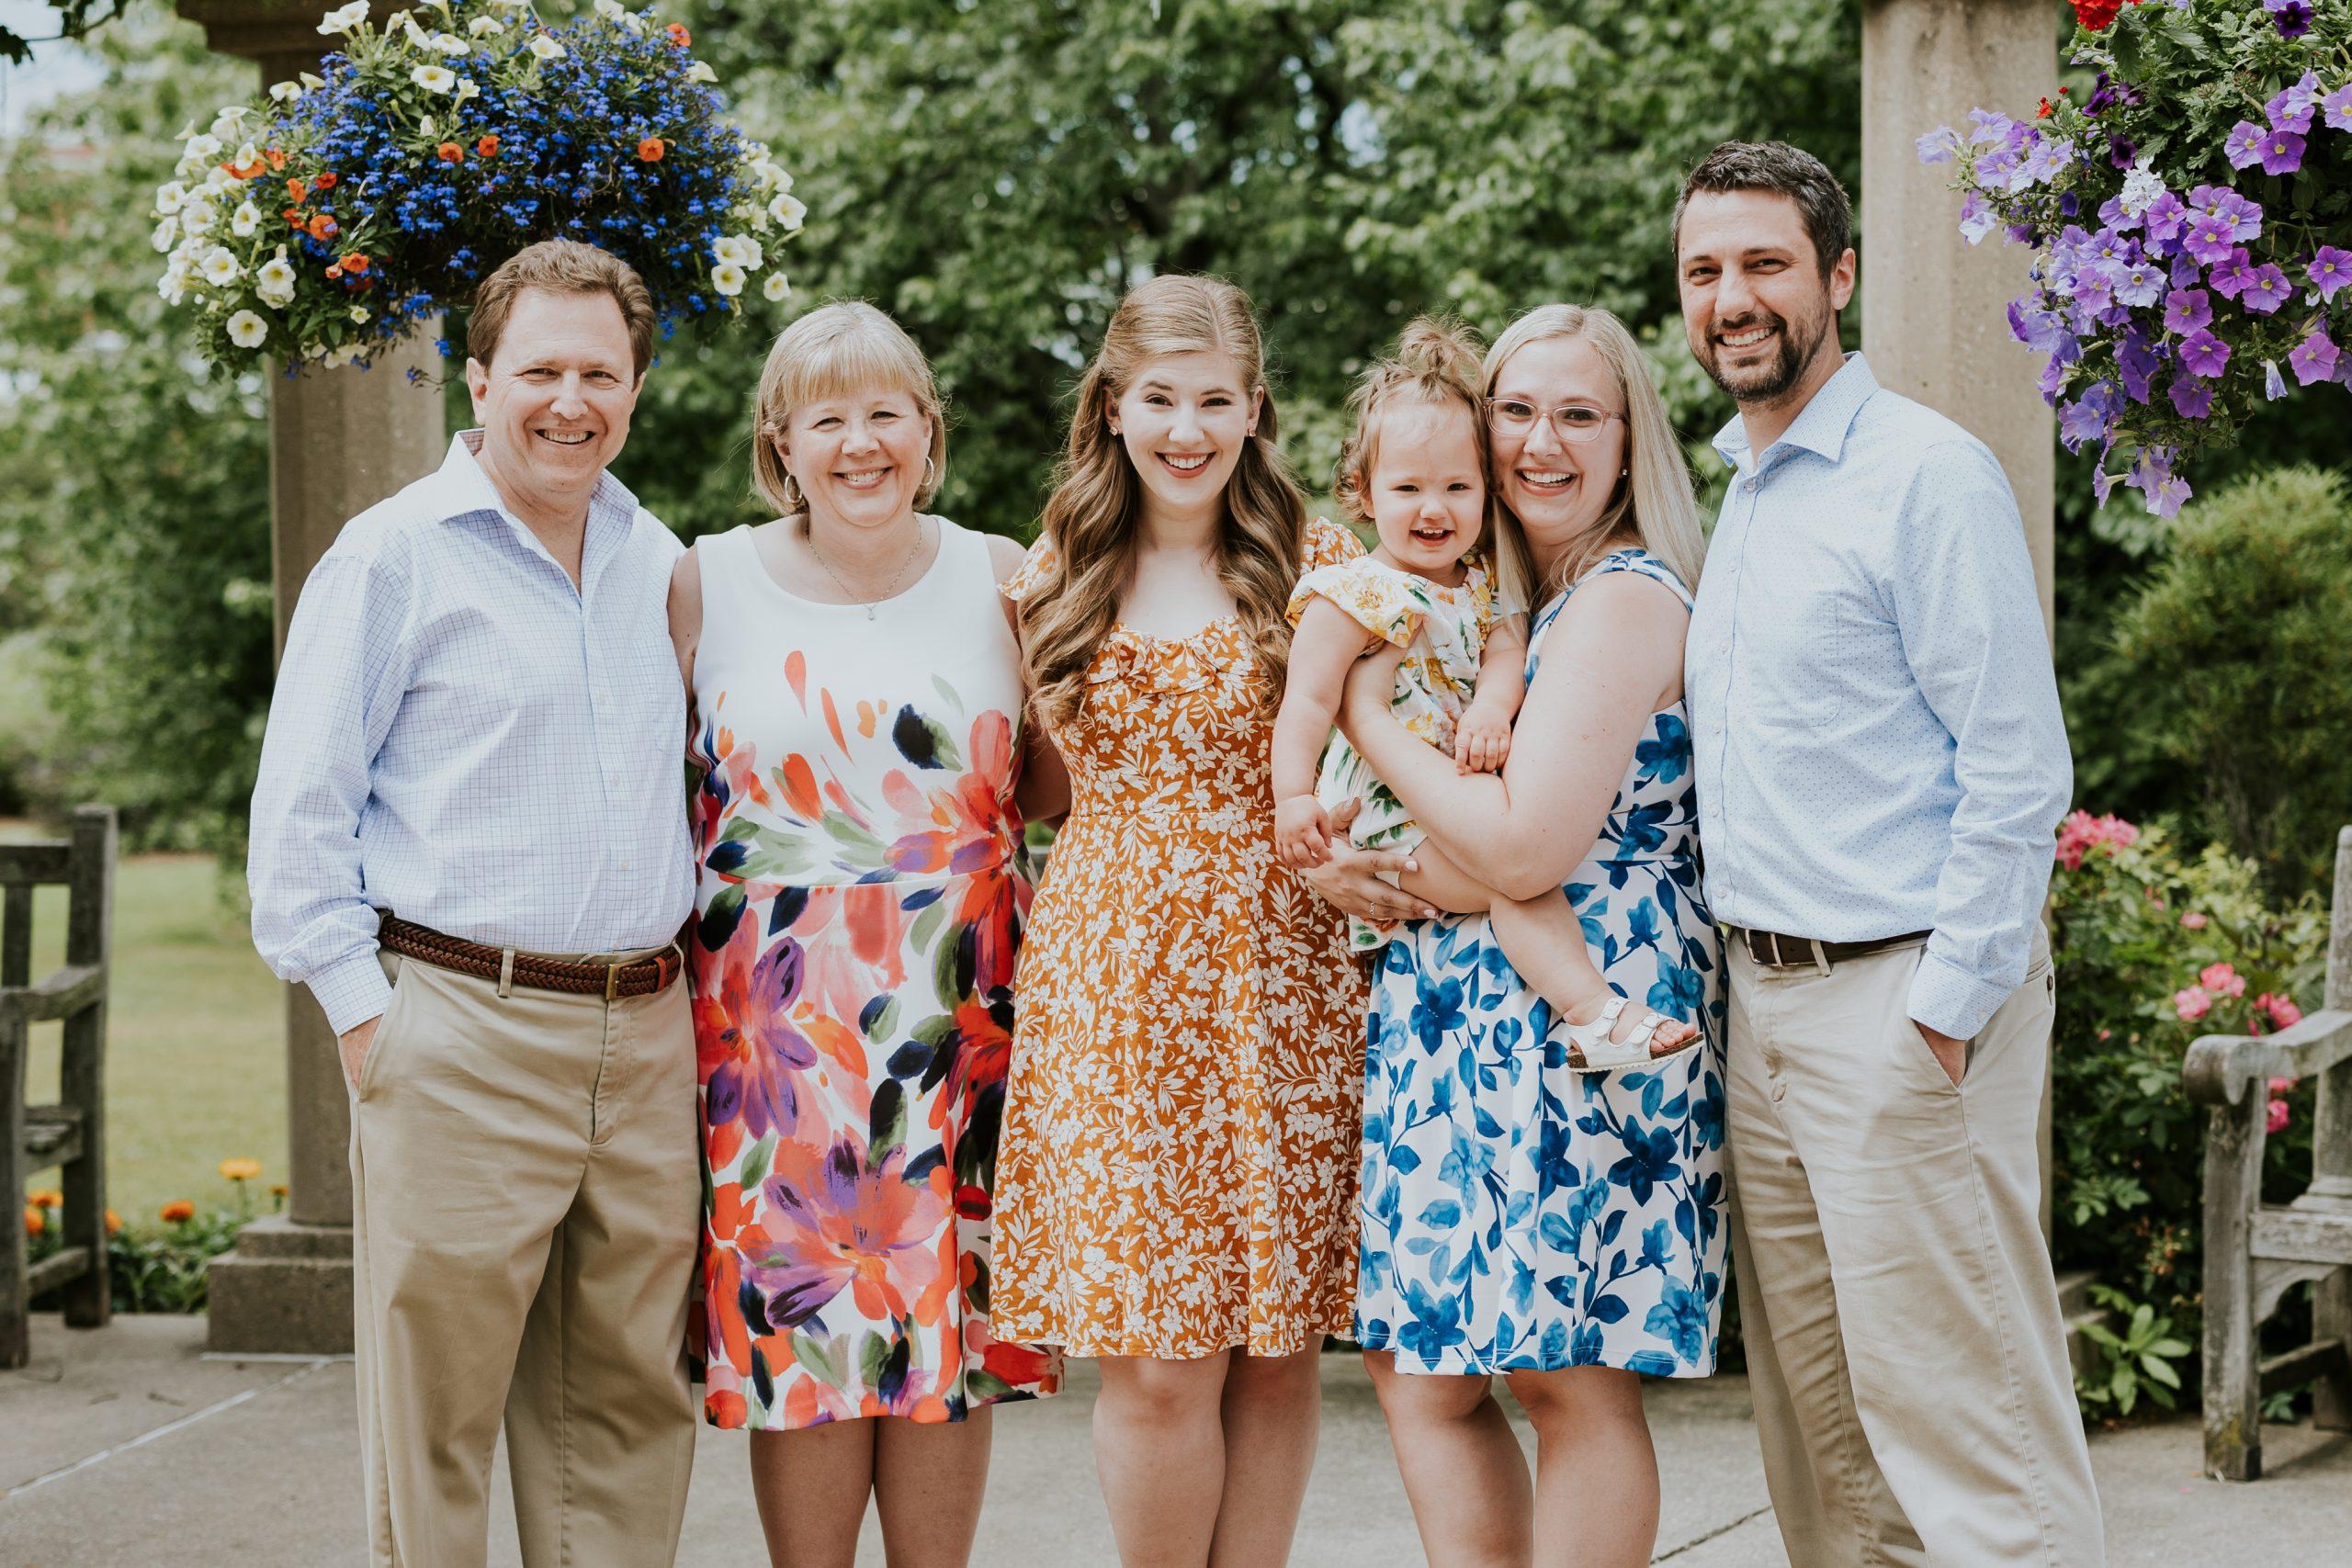 Michelle's Immediate Family